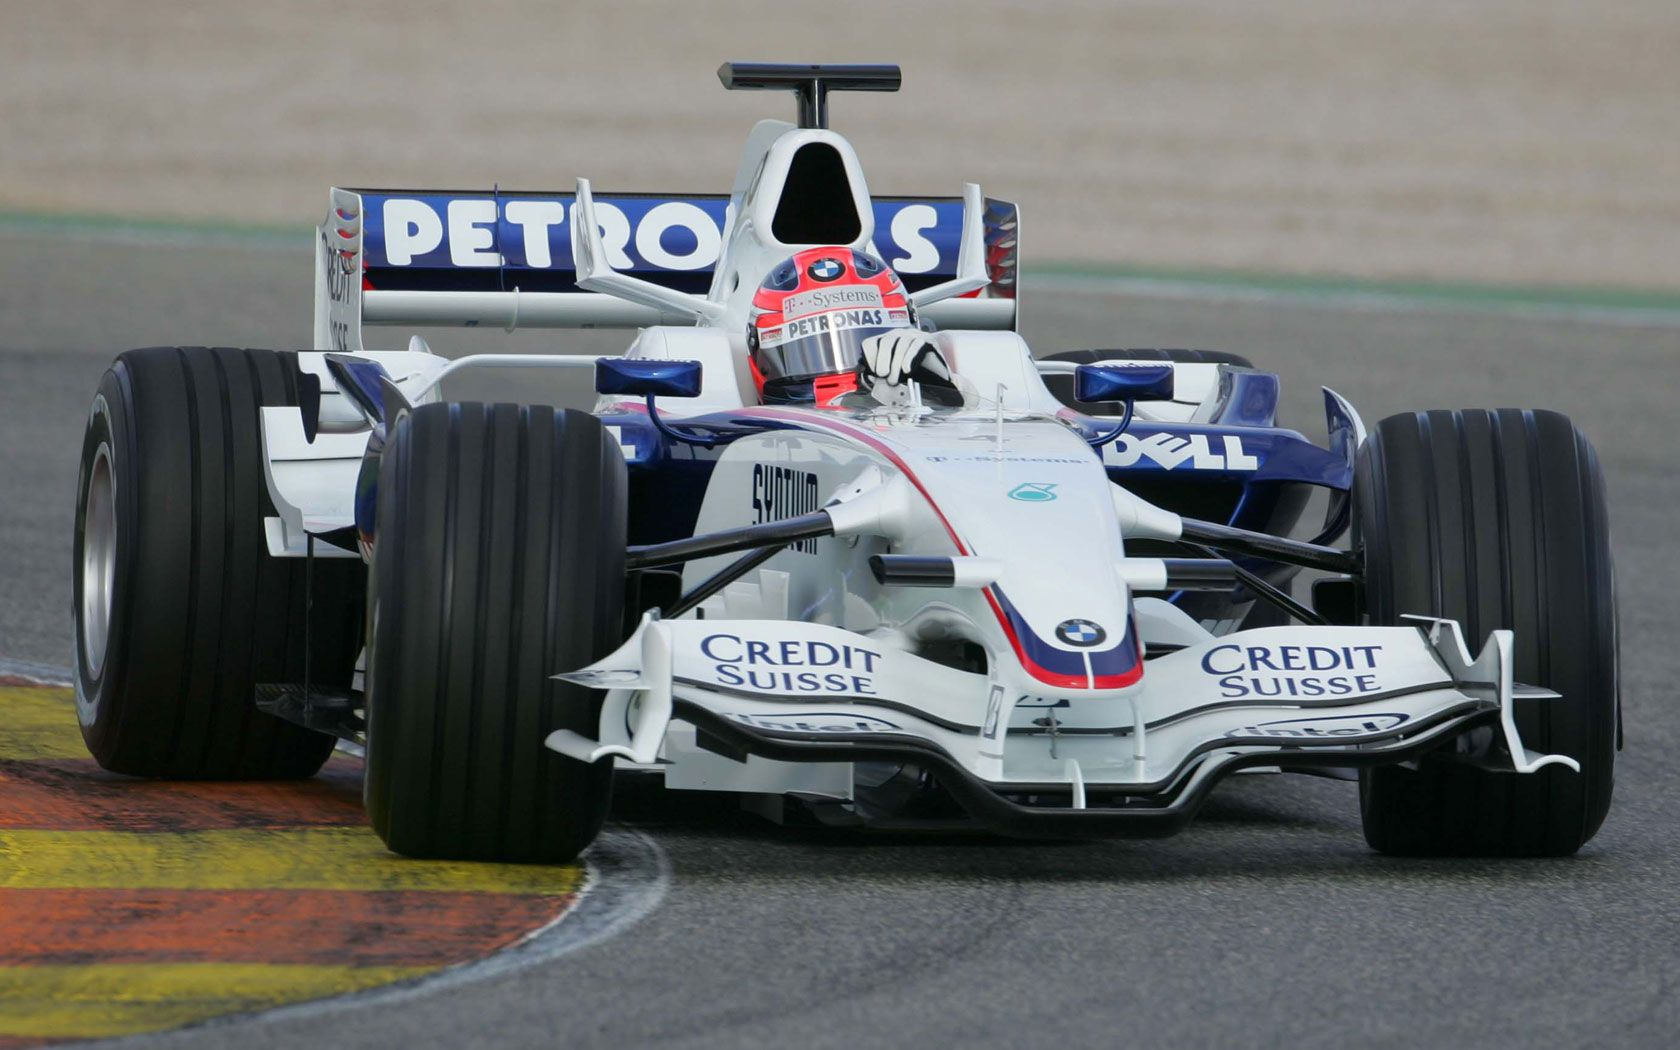 Robert Kubica wins the Canadian Grand Prix 2008. First win